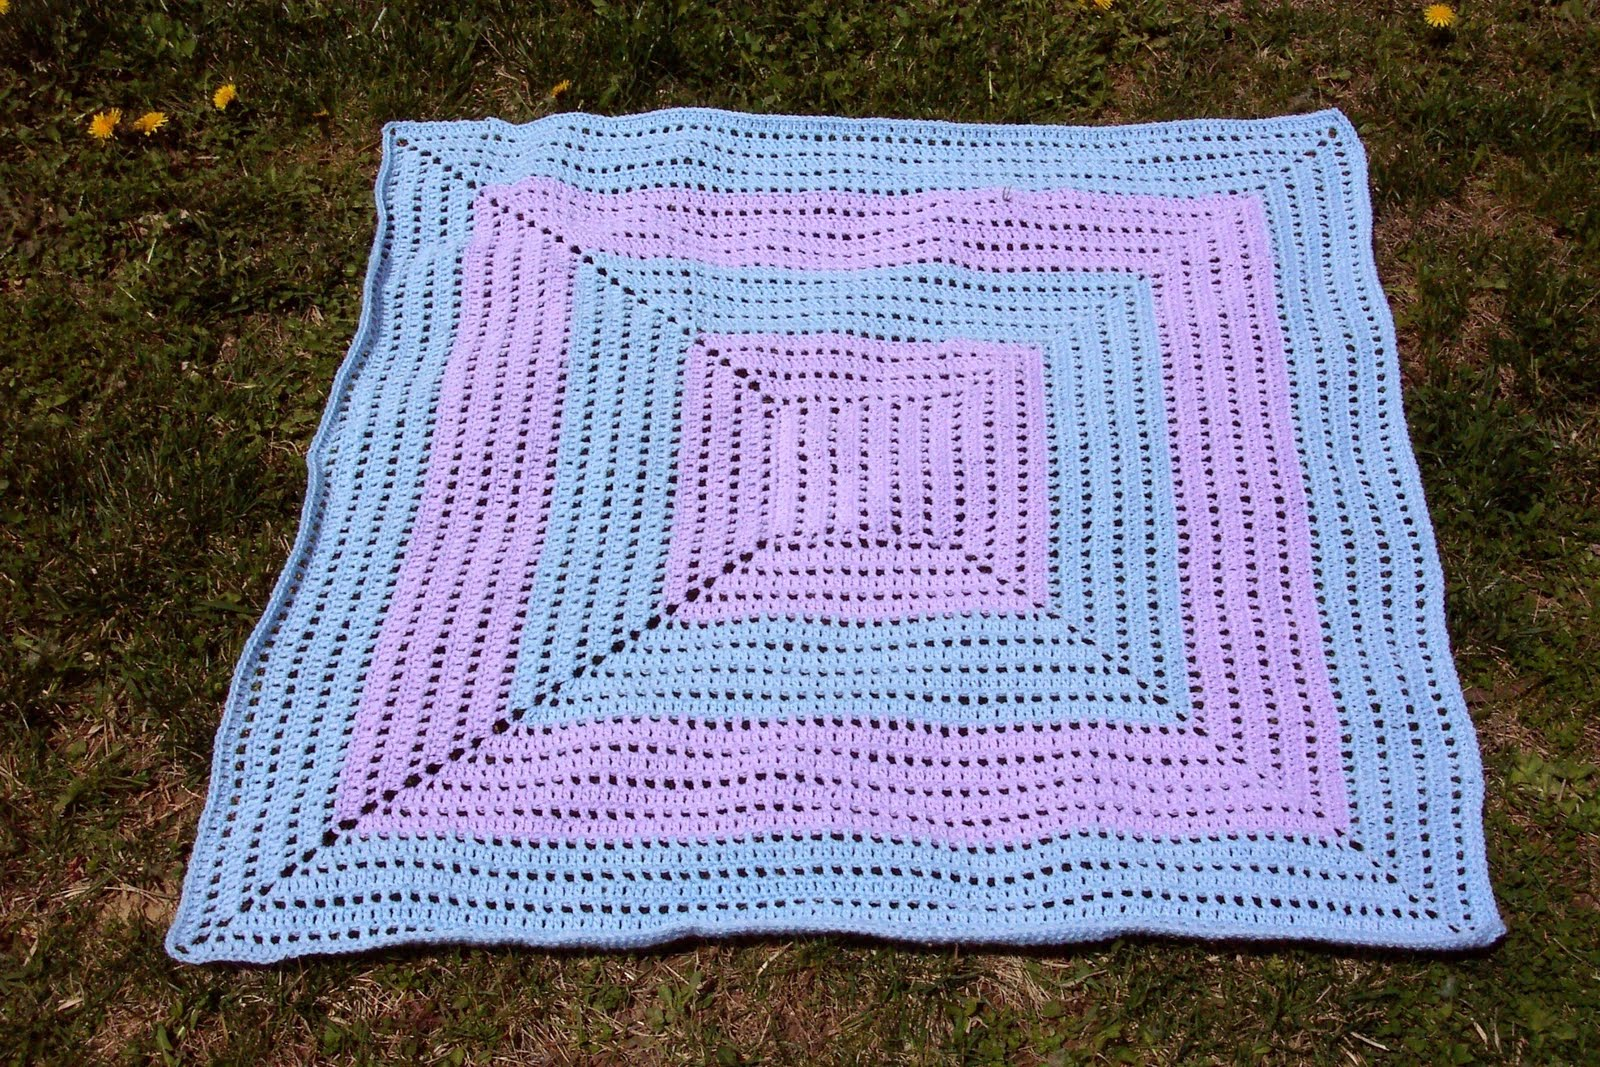 SmoothFox Crochet and Knit: SmothFox\'s A Whole Lotta Holes 12x12 ...